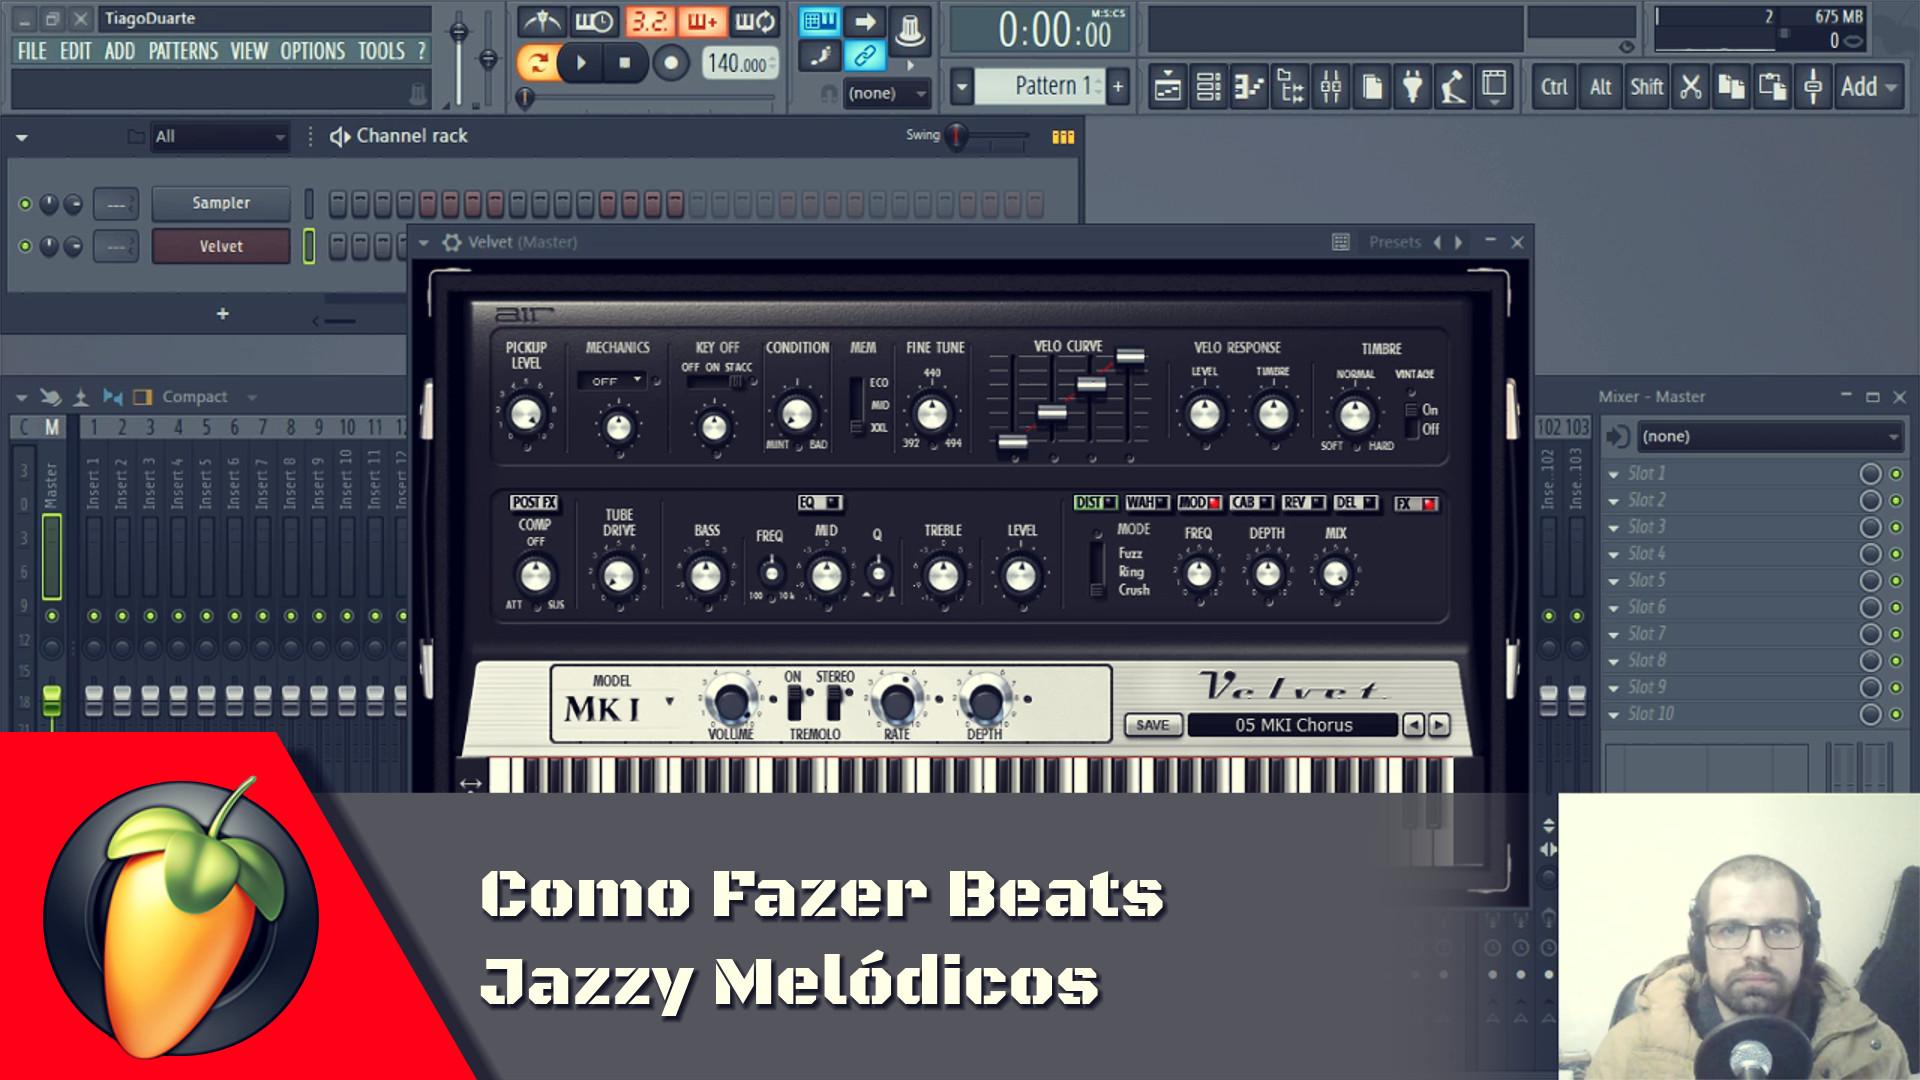 Como Fazer Beats Jazzy Melodicos